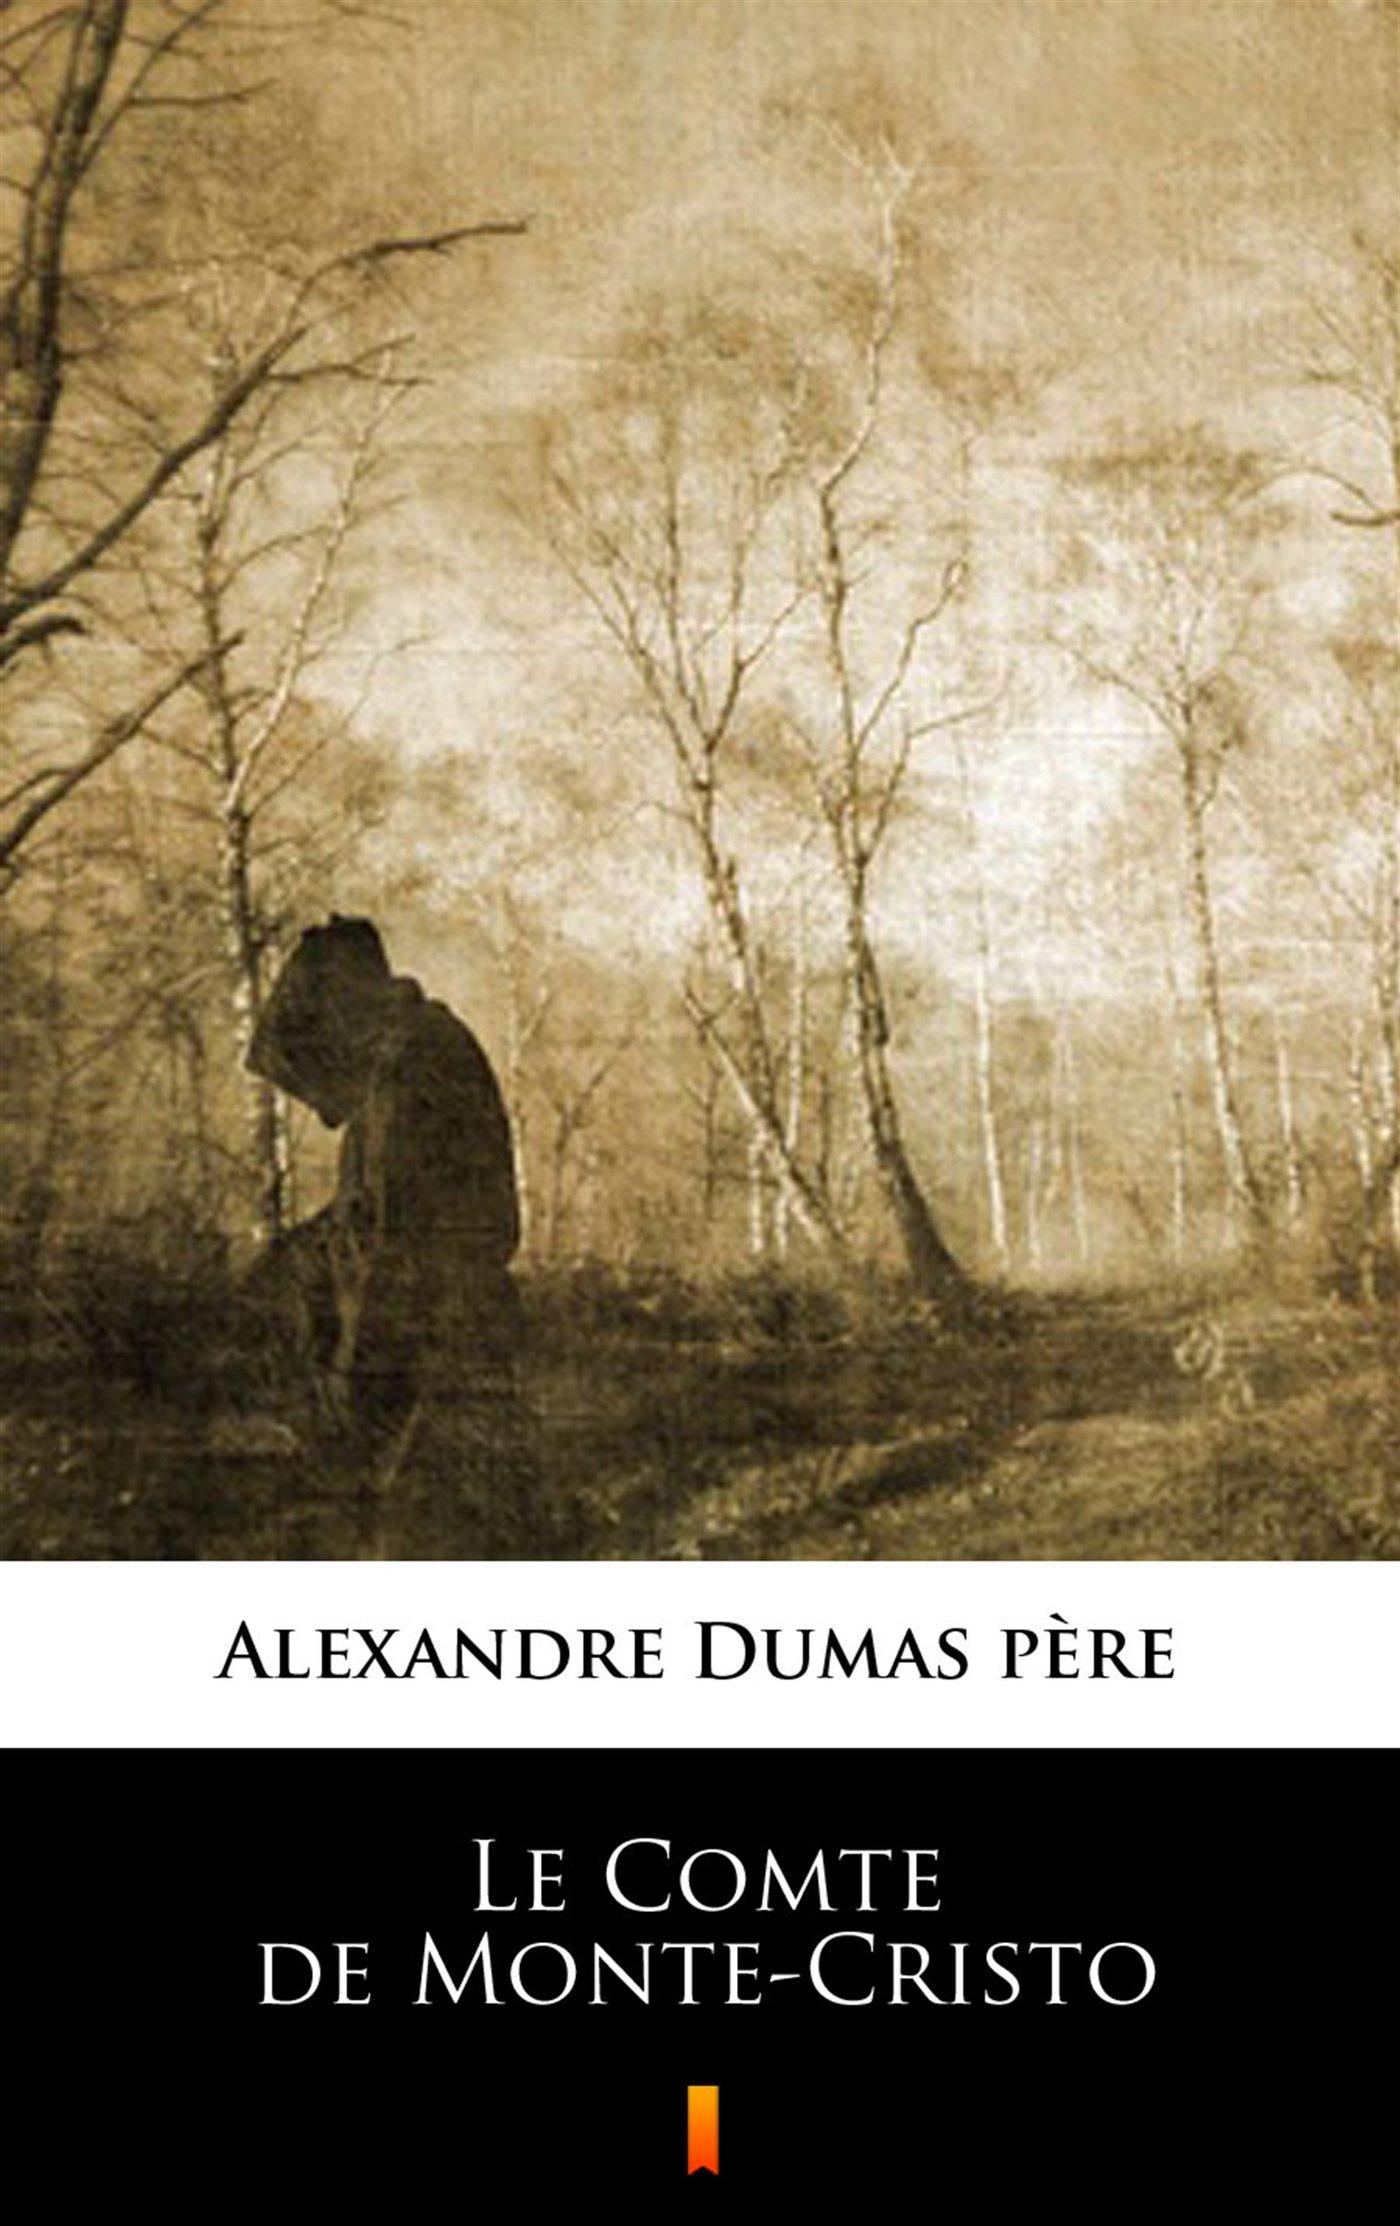 Le Comte de Monte-Cristo - Ebook (Książka EPUB) do pobrania w formacie EPUB